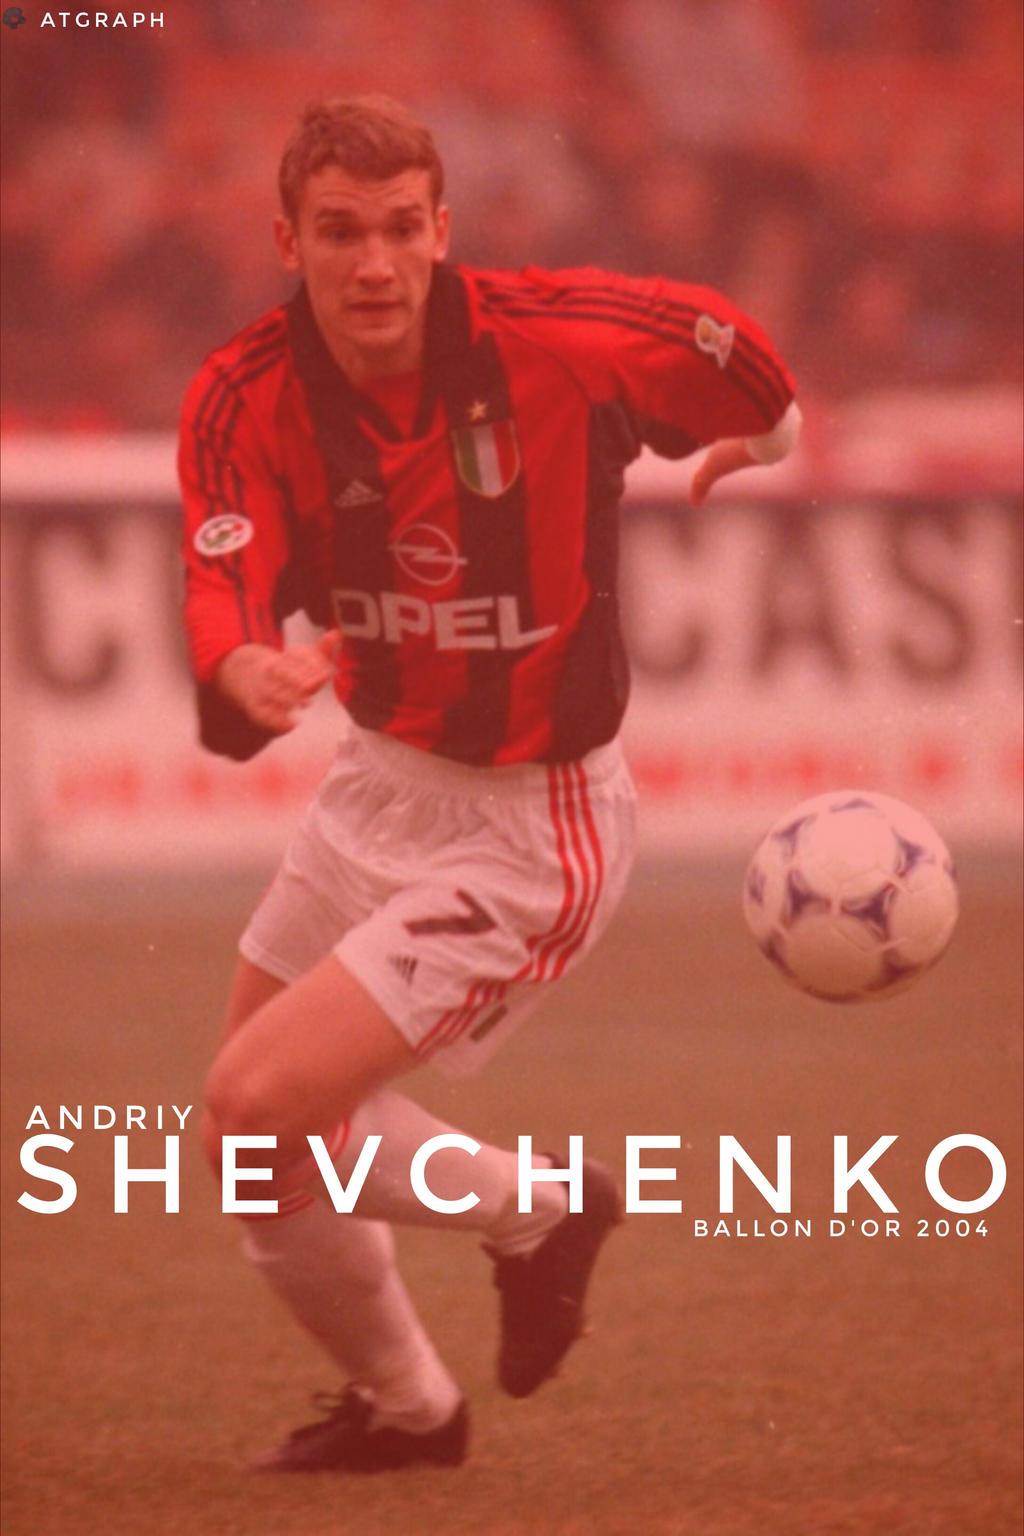 Andriy Shevchenko Wallpaper HD by ATGraph on DeviantArt